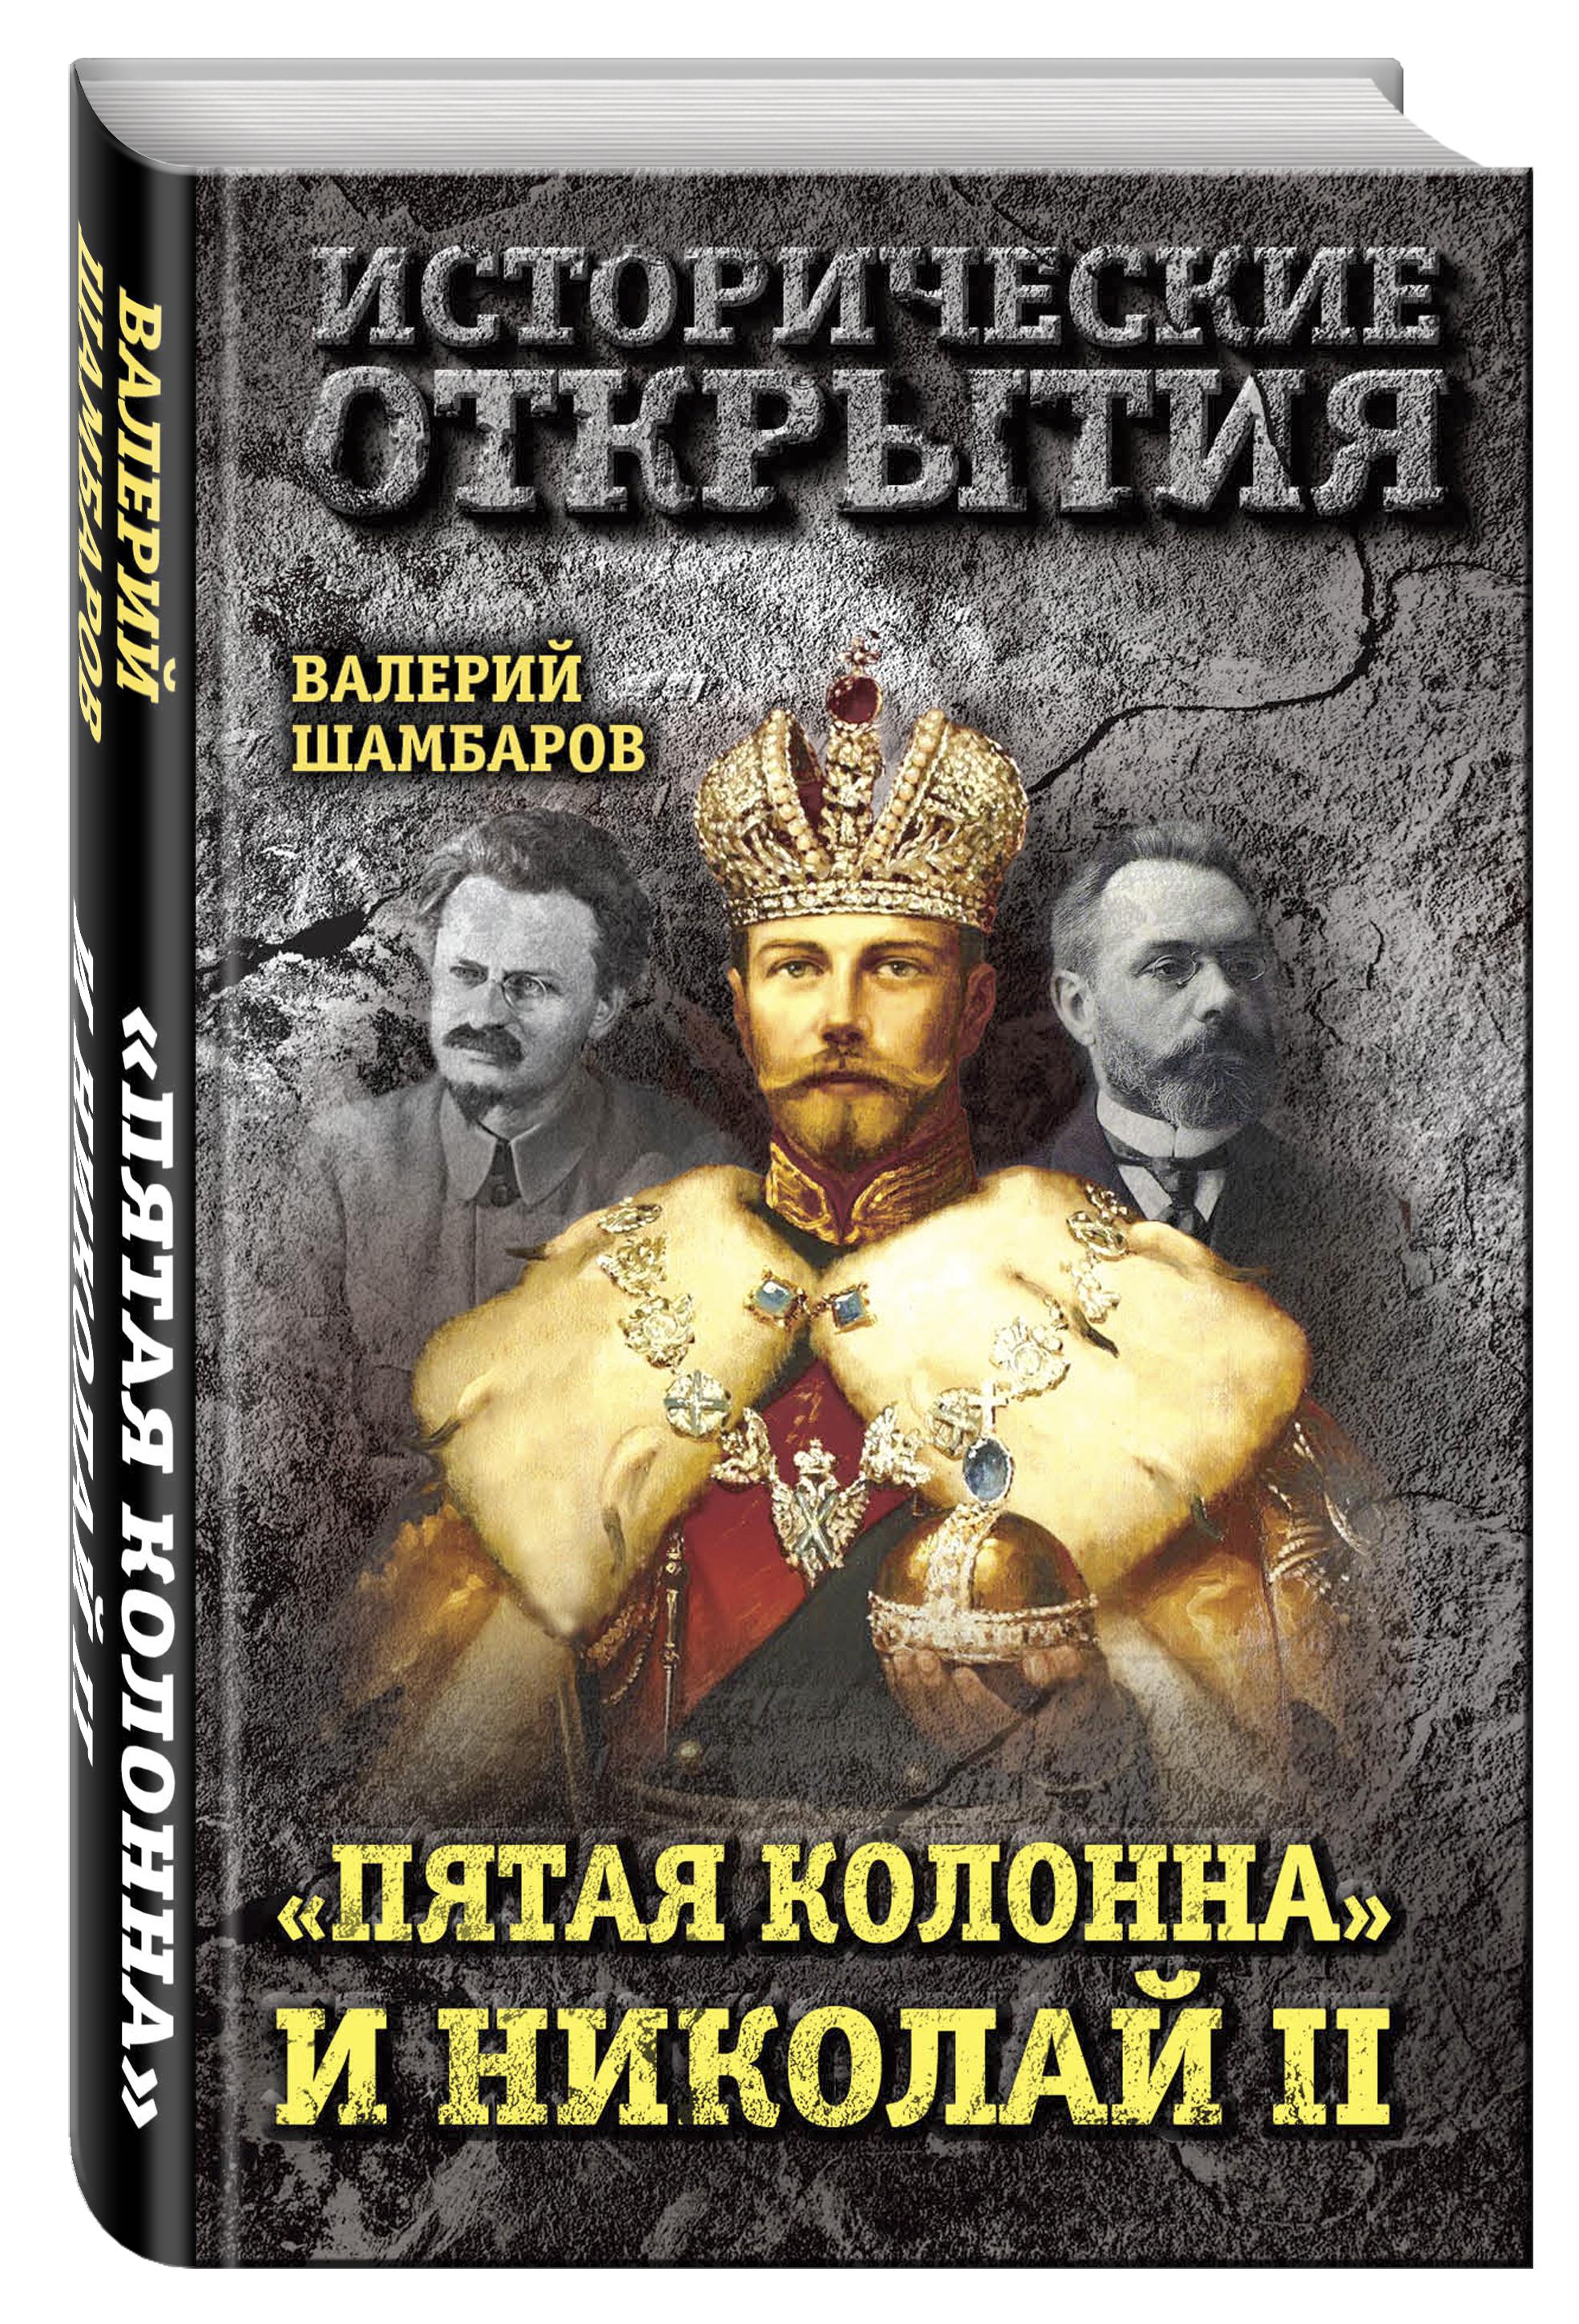 Валерий Шамбаров «Пятая колонна» и Николай II бушин в пятая колонна отпор клеветникам